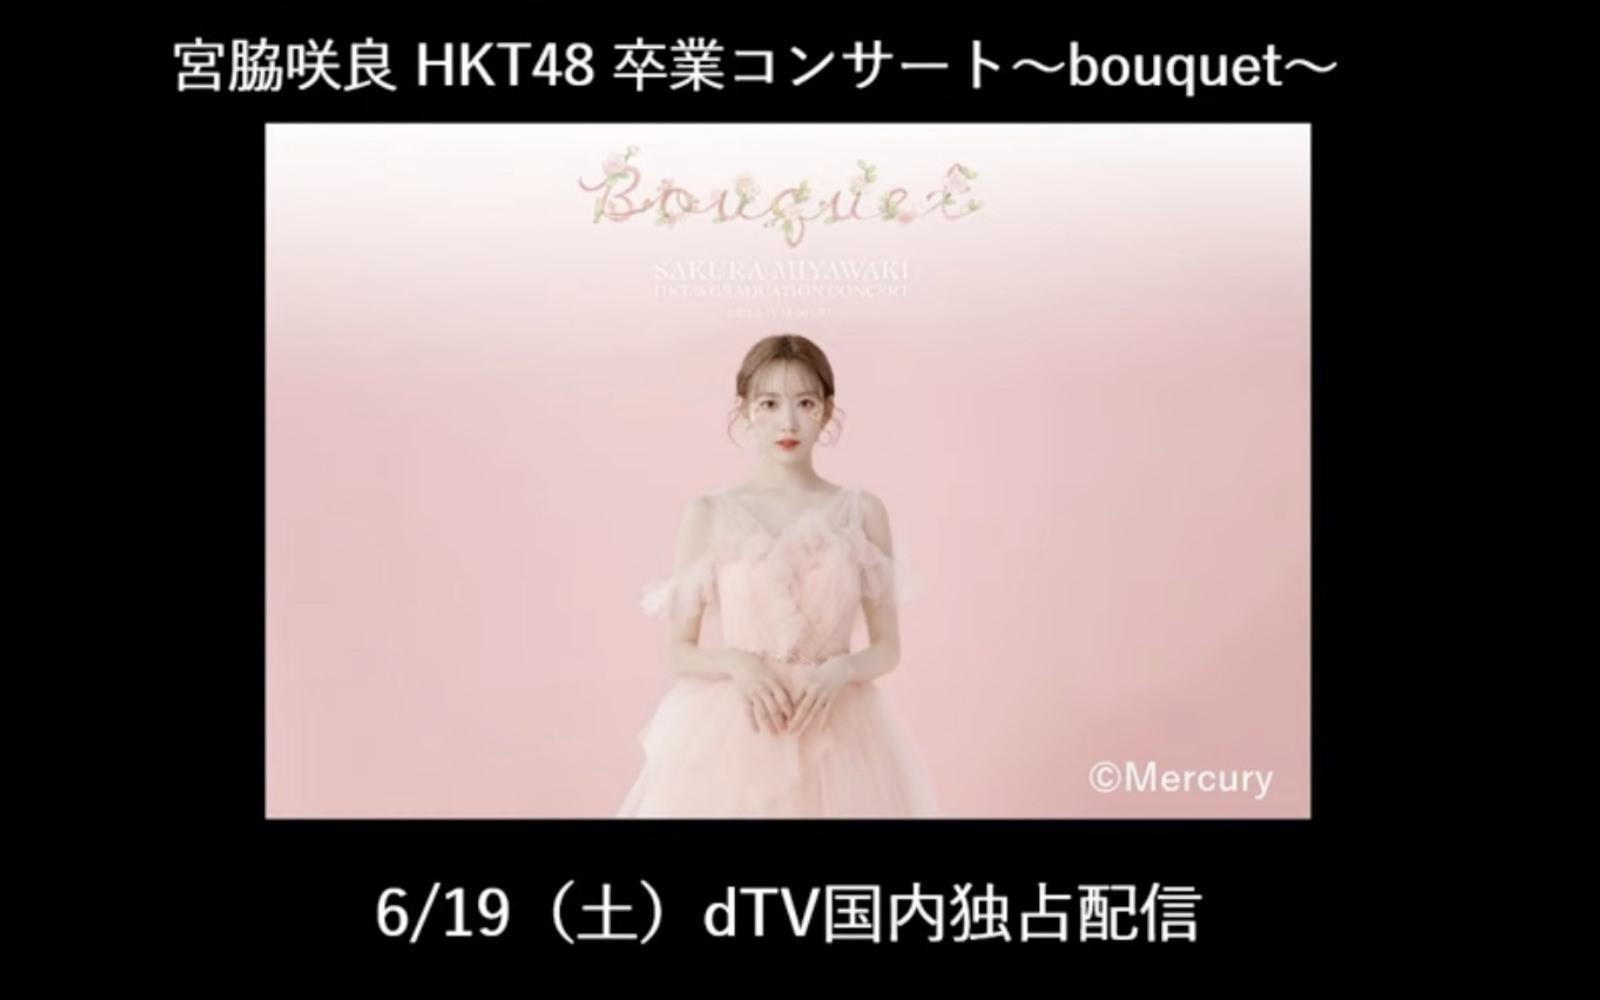 Miyawaki sakura hkt48 bouquet